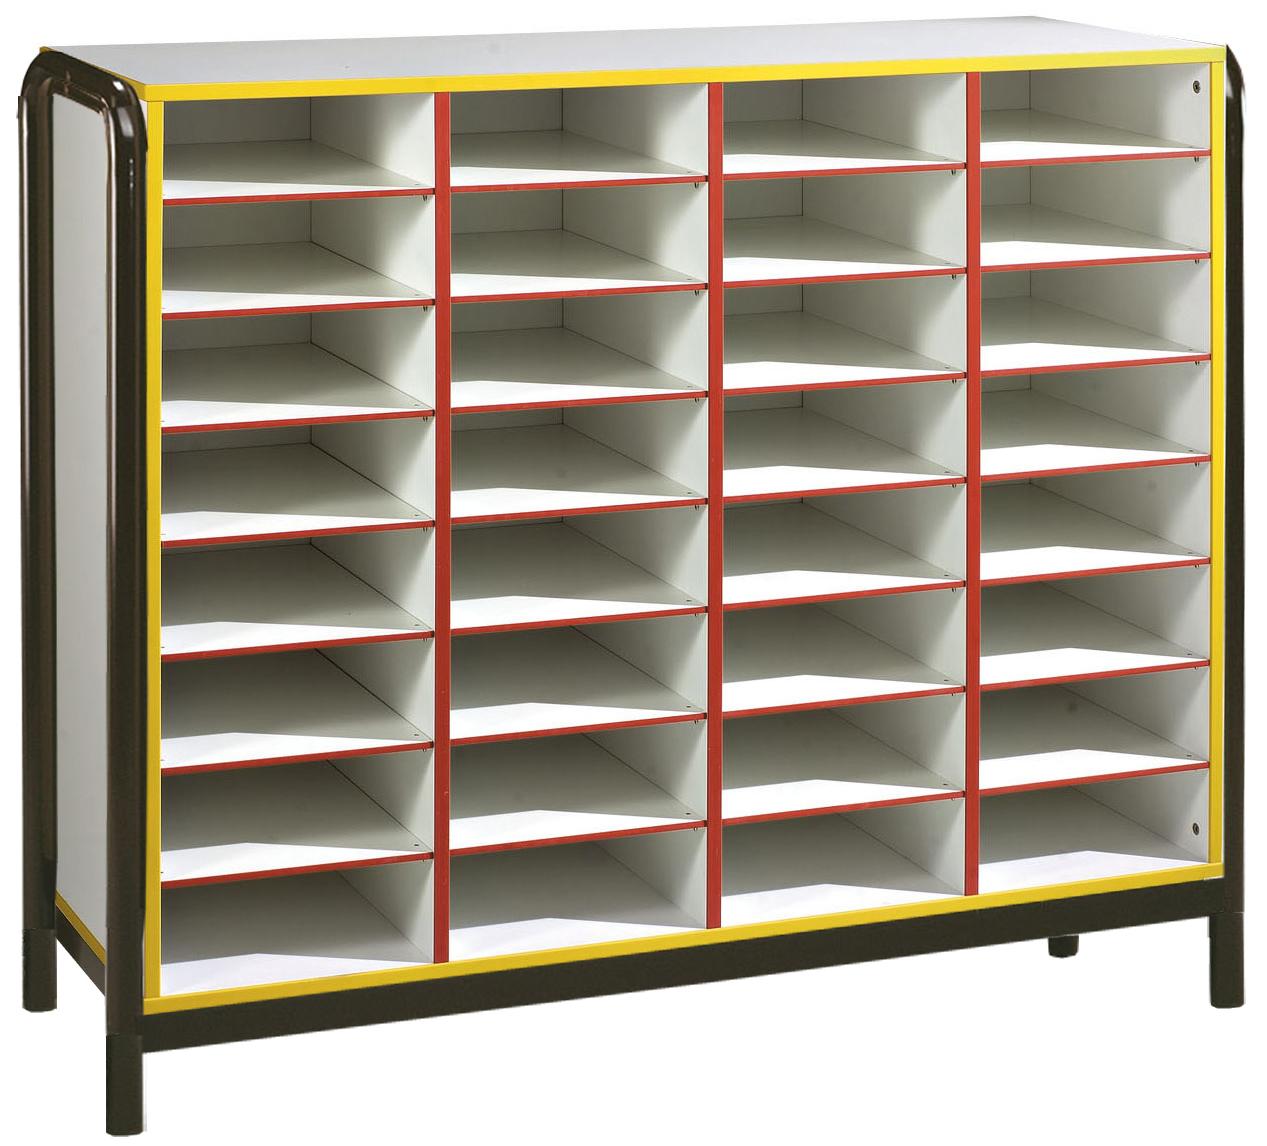 Meuble 32 cases - piétement latéral métal